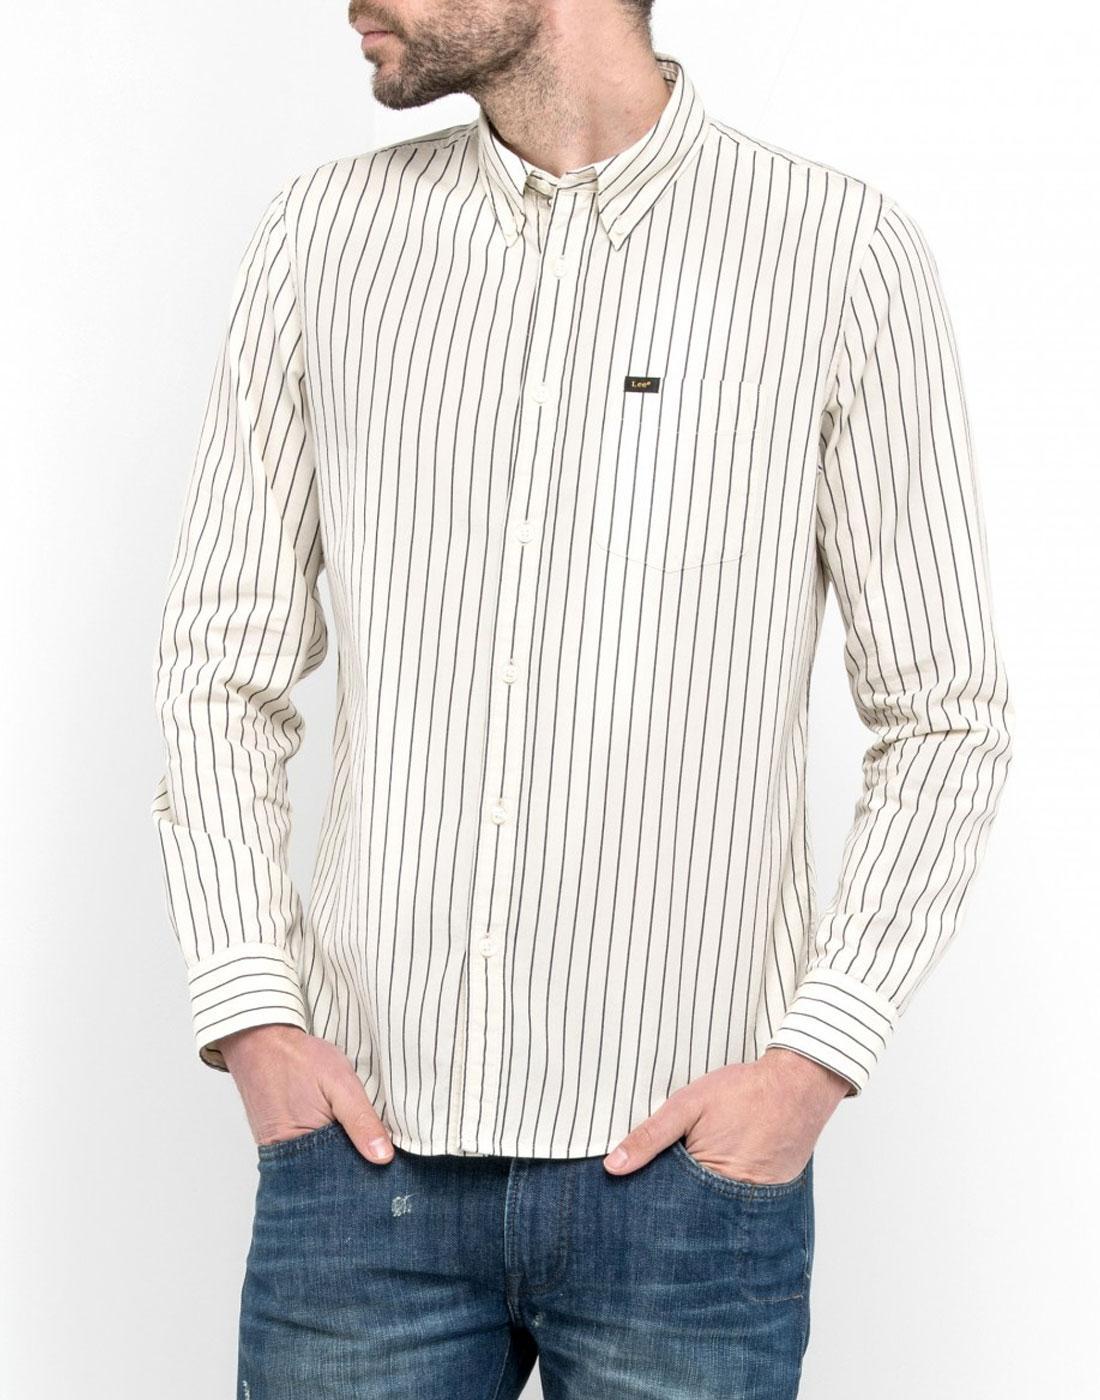 LEE Retro 90s Mod Stripe Button Down Collar Shirt